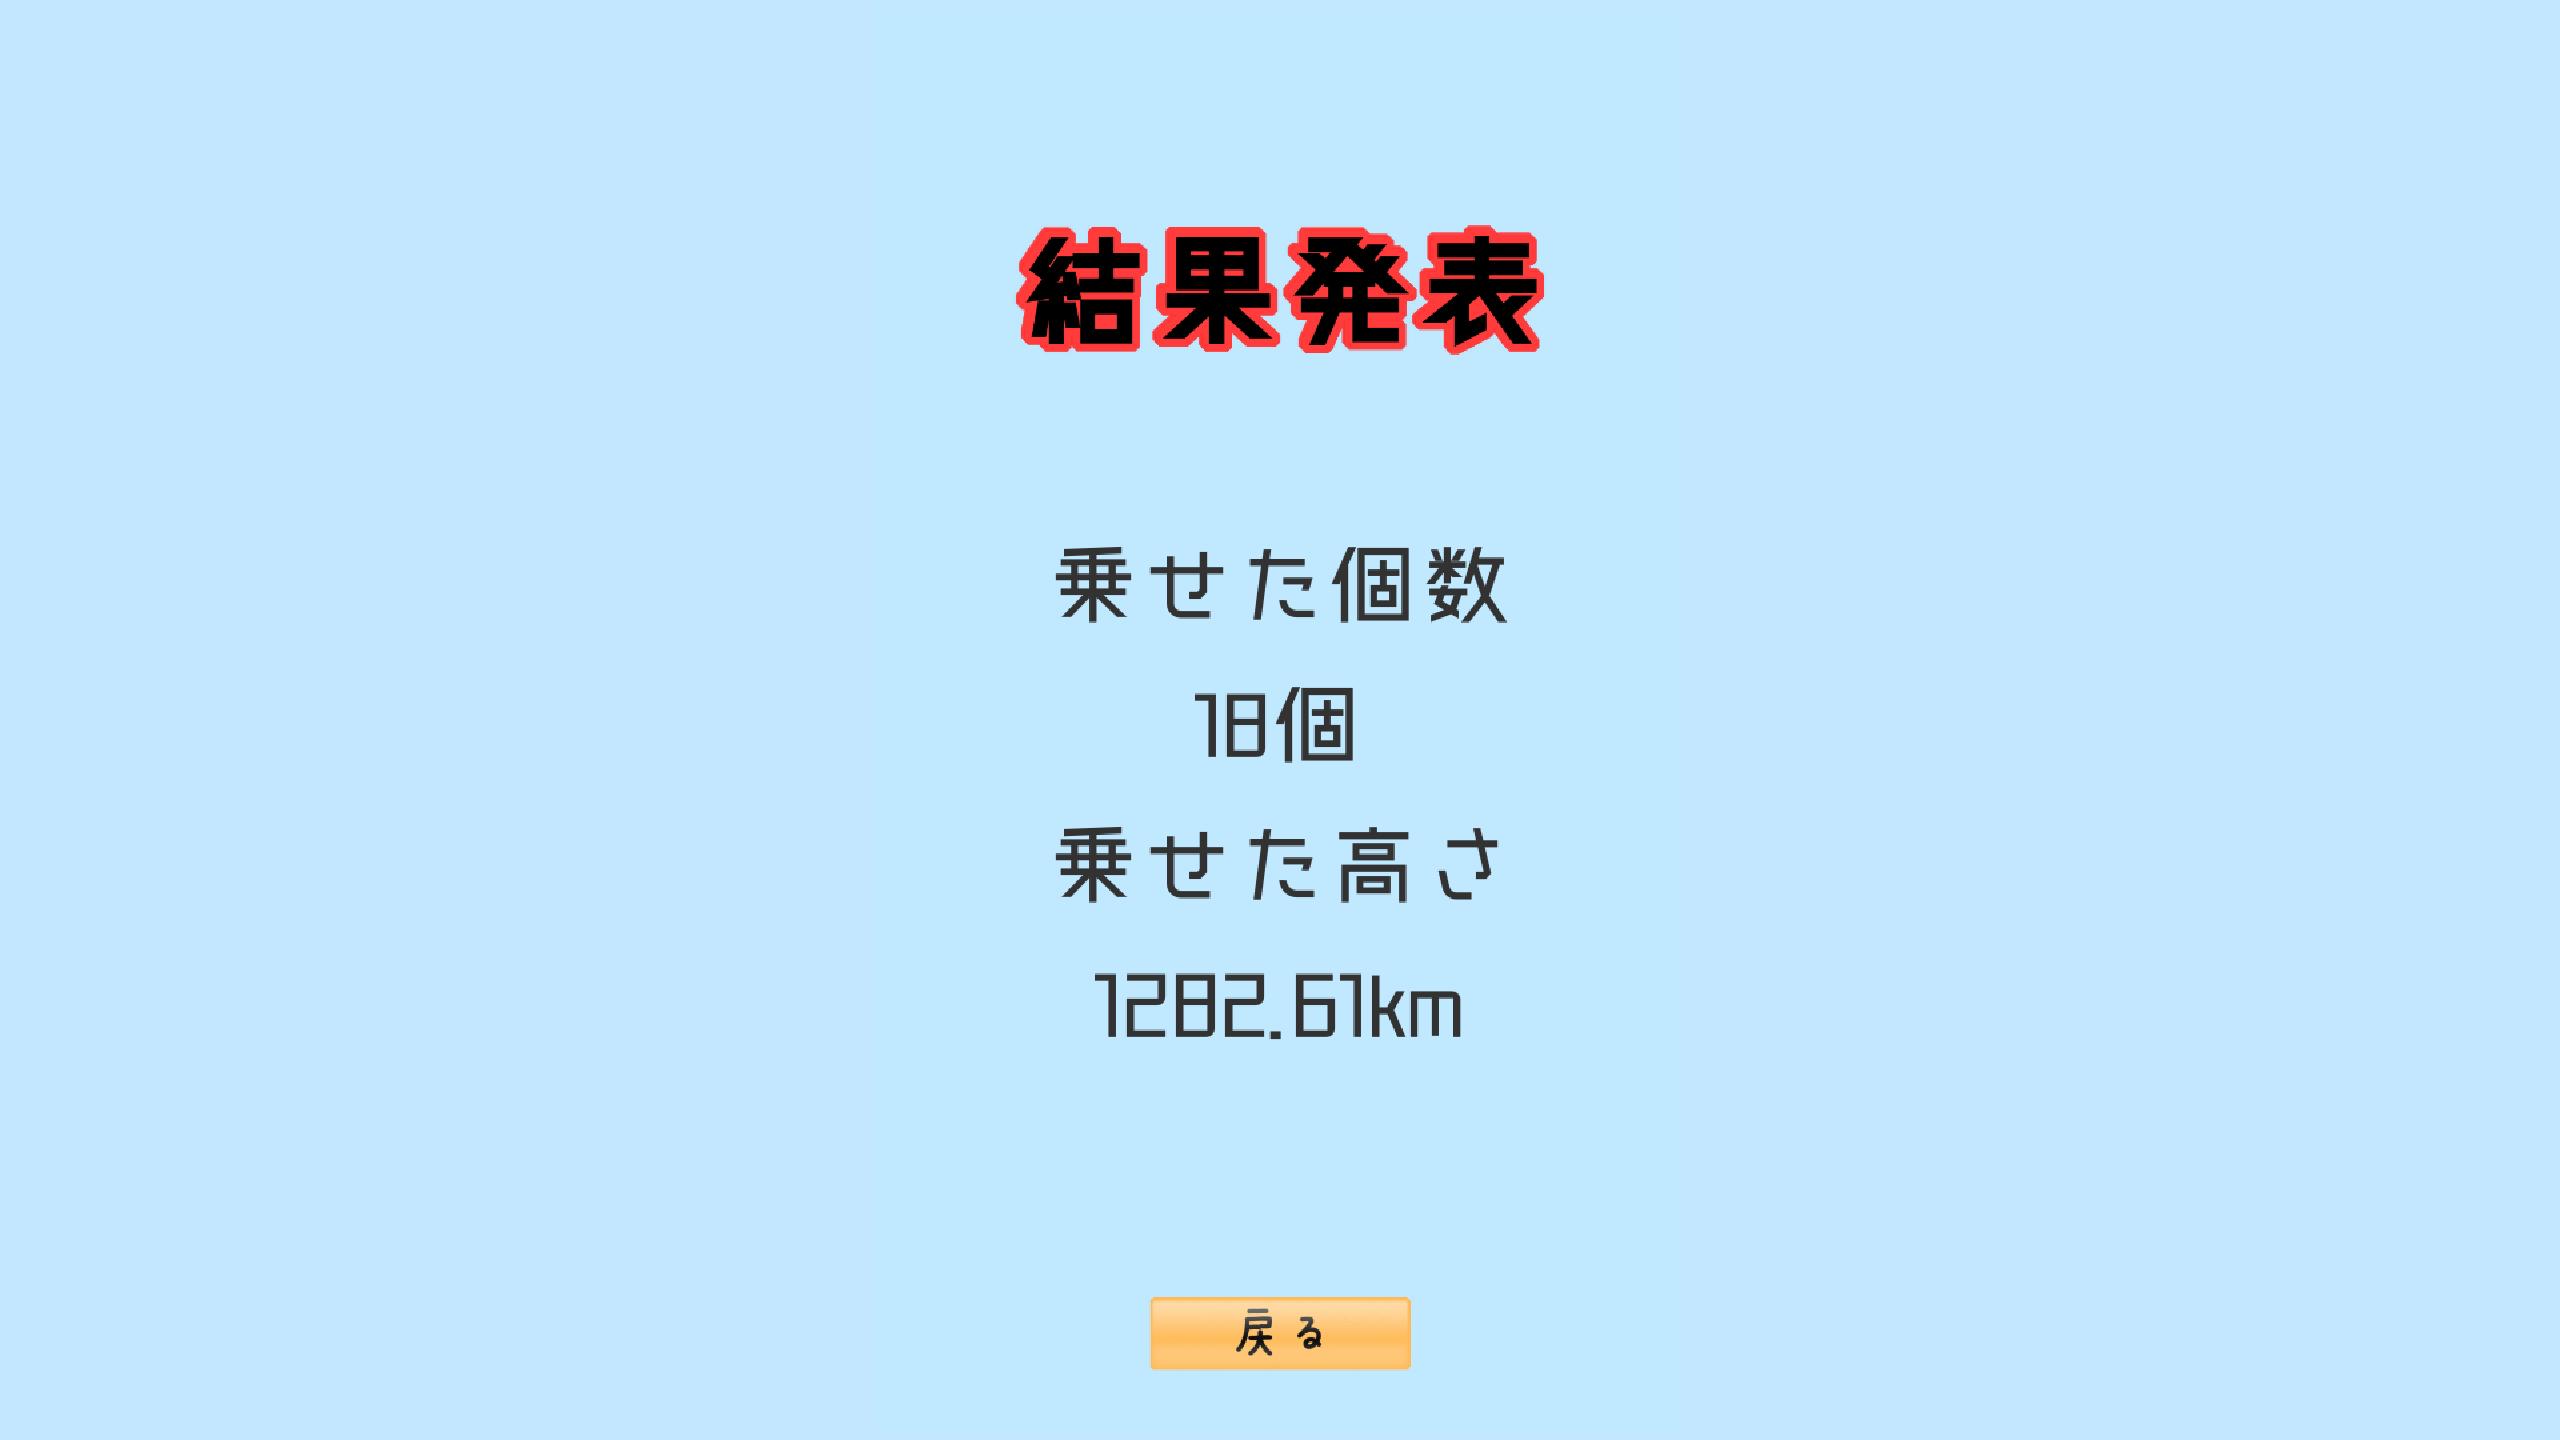 2017-11-04 (2)